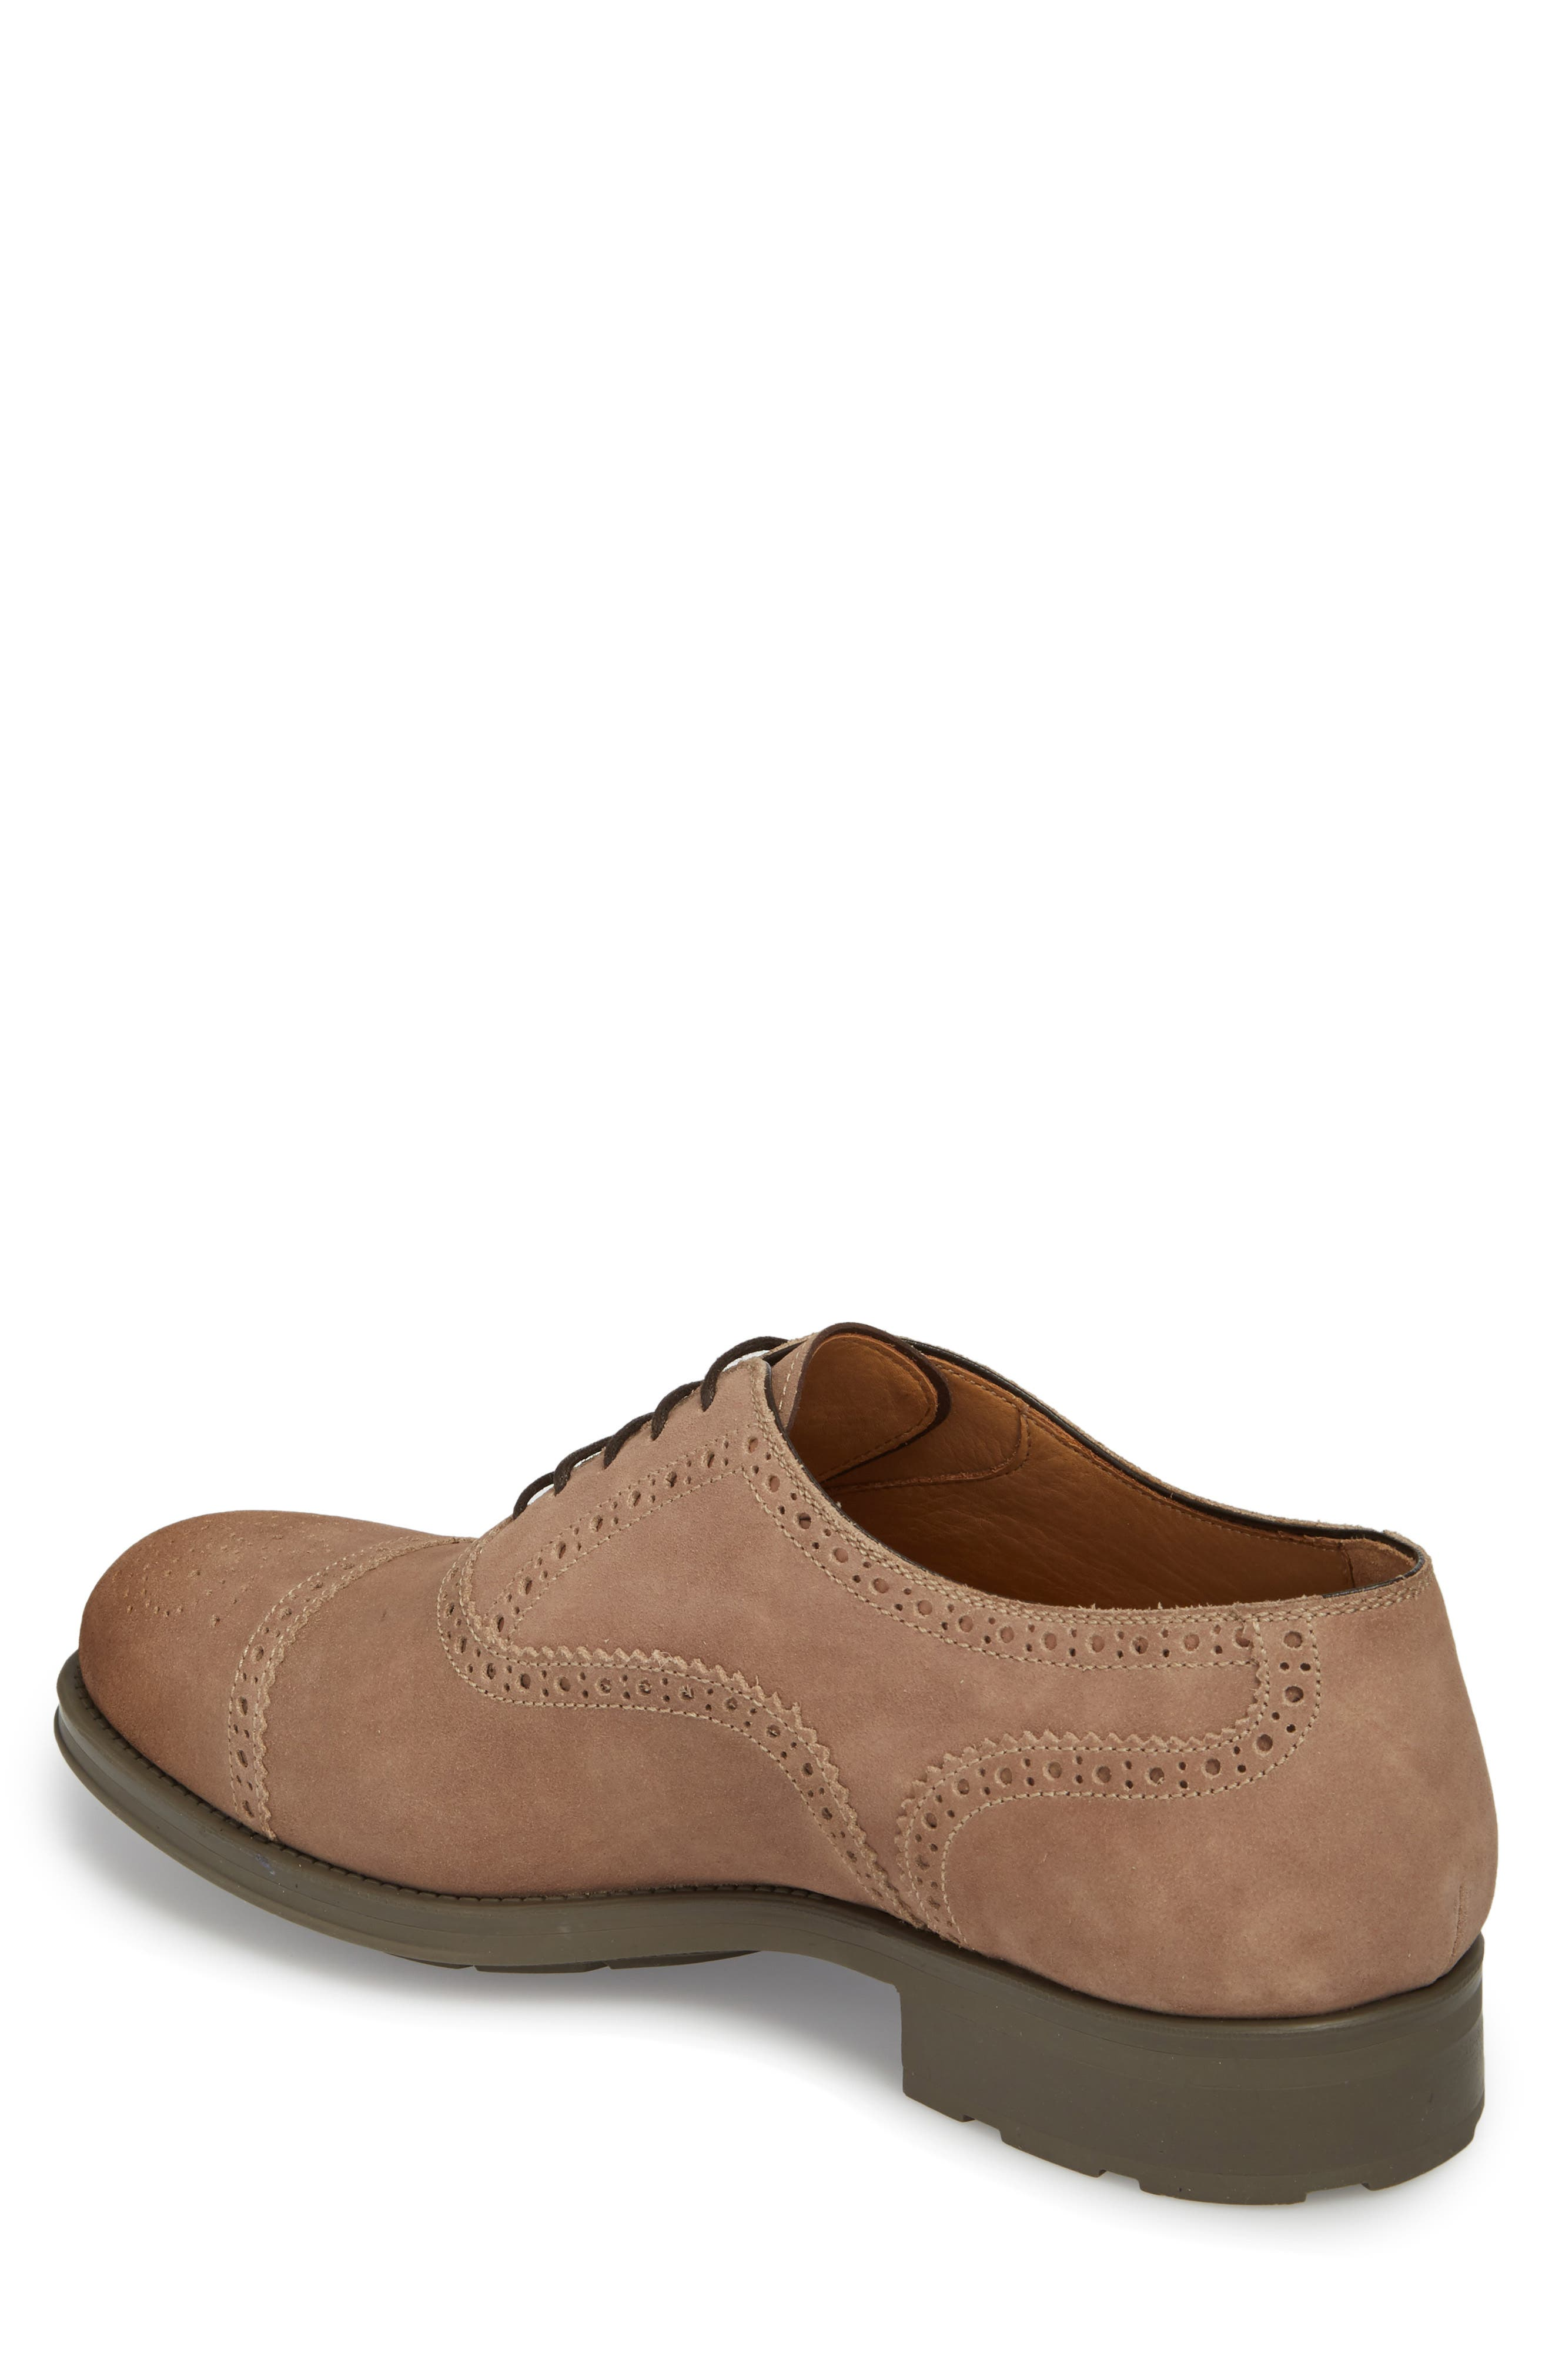 Winslo Cap Toe Oxford,                             Alternate thumbnail 2, color,                             Khaki Leather